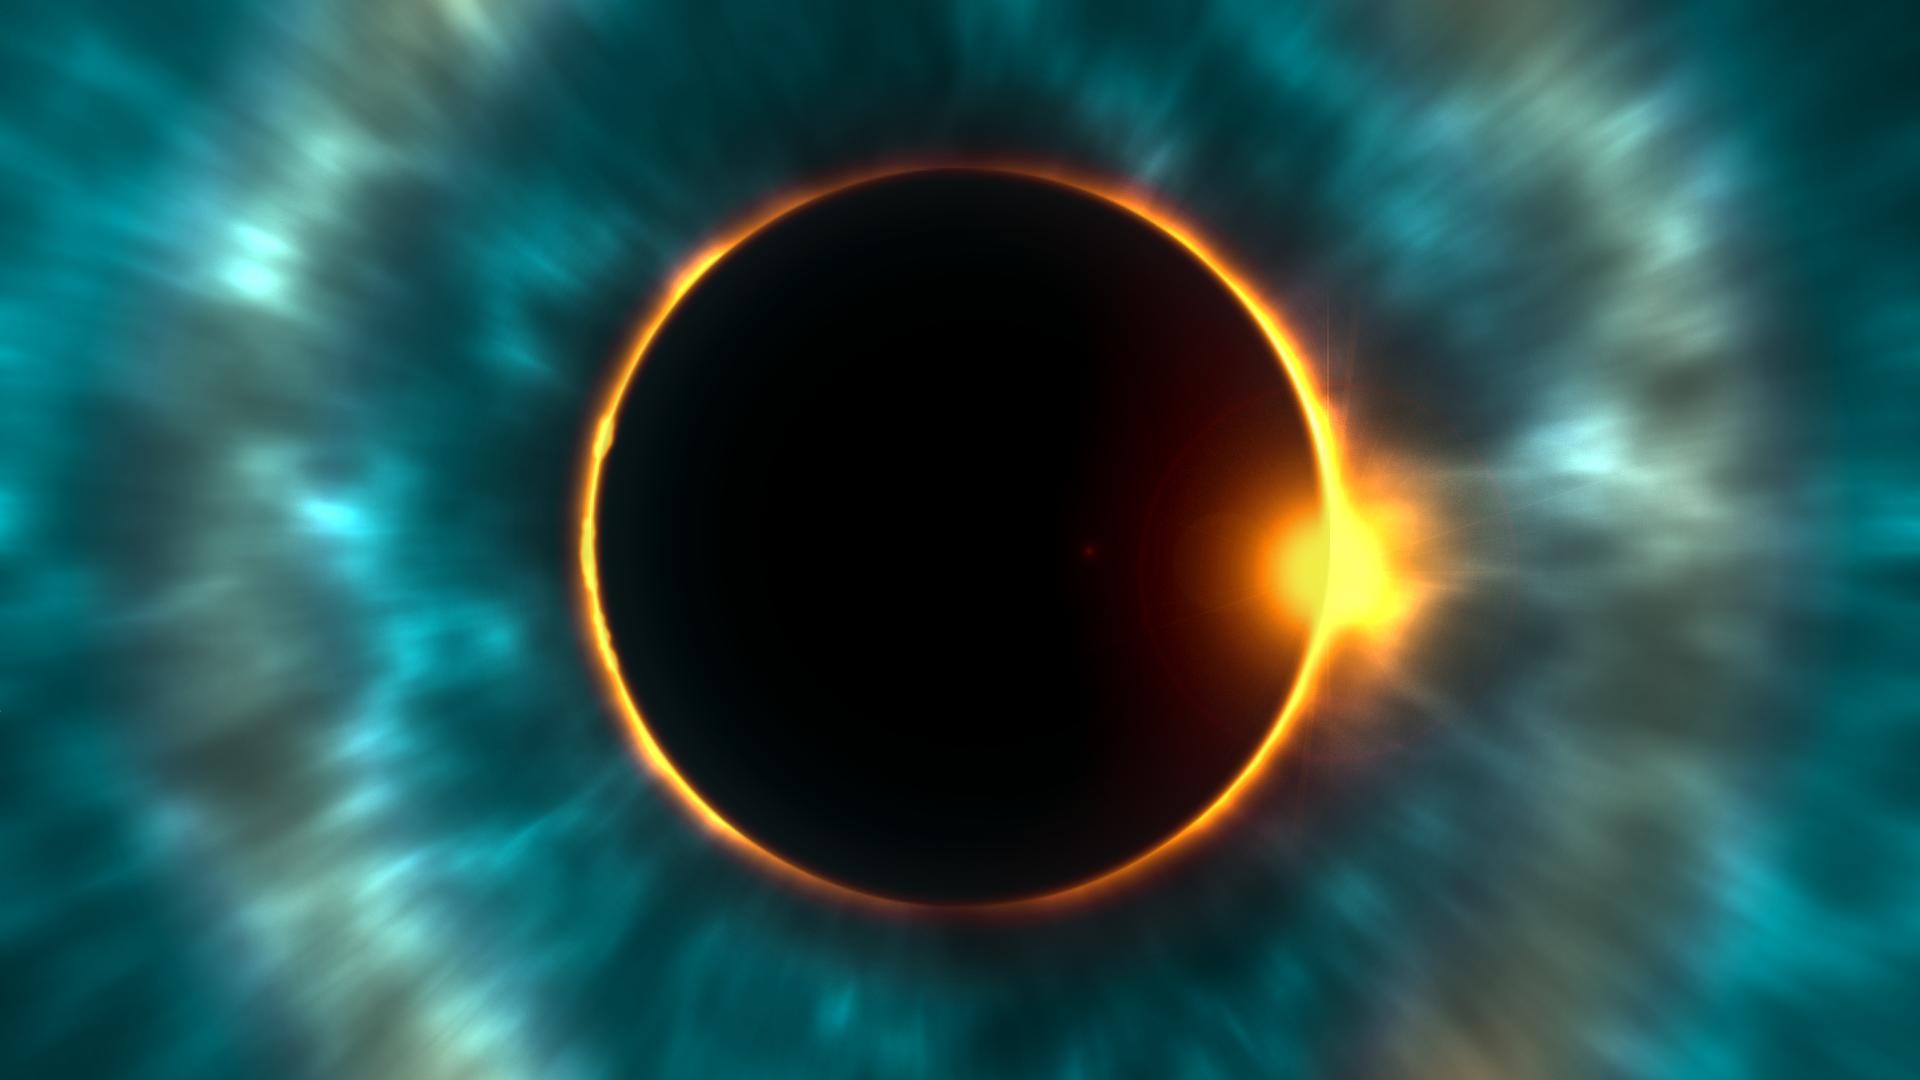 Eclipse, Sole, Cielo, Scienza, luce, aloni - Sfondi HD - Professor-falken.com